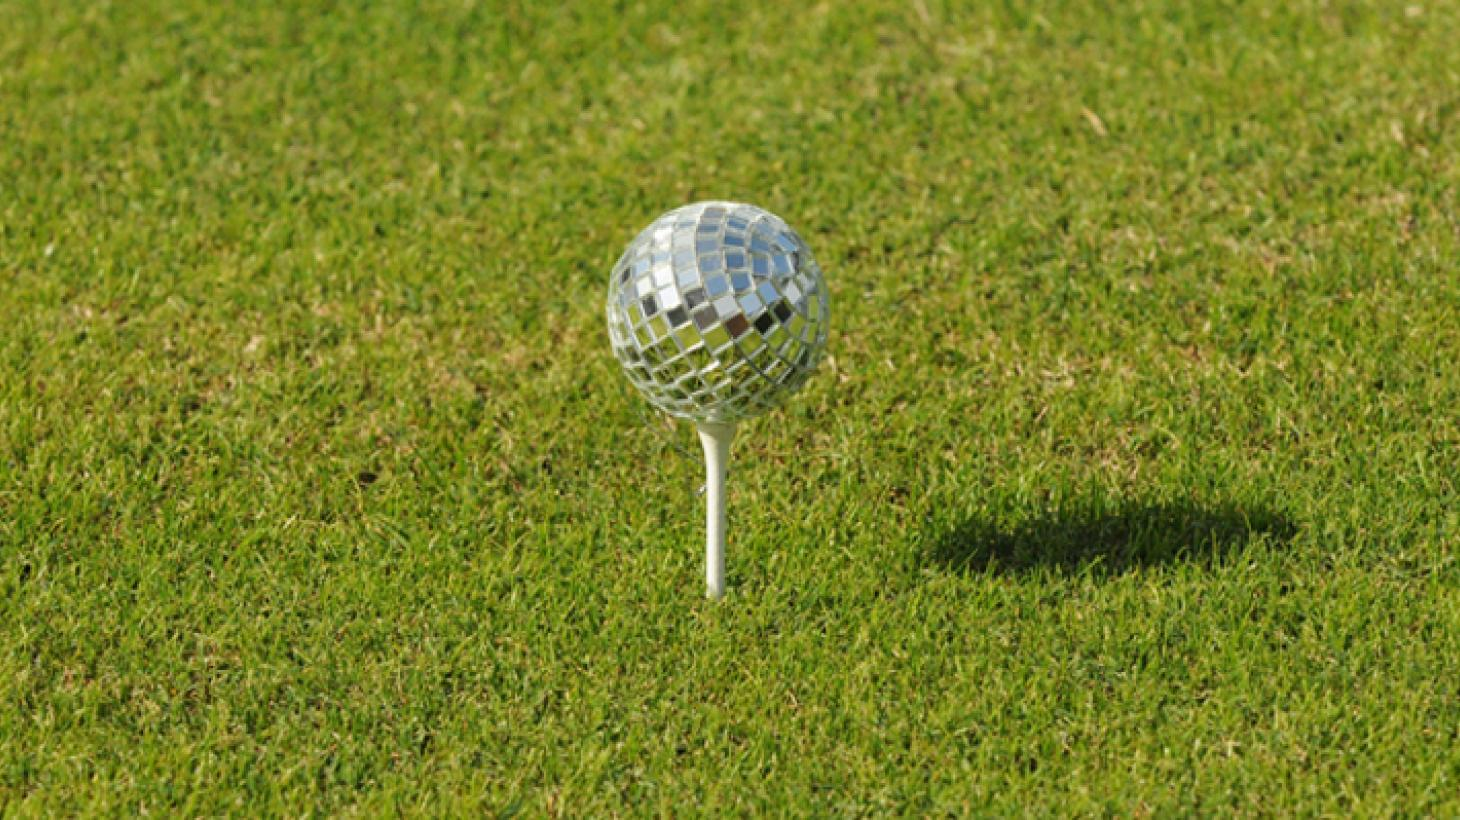 6 themed golf tournament ideas for halloween season | golf